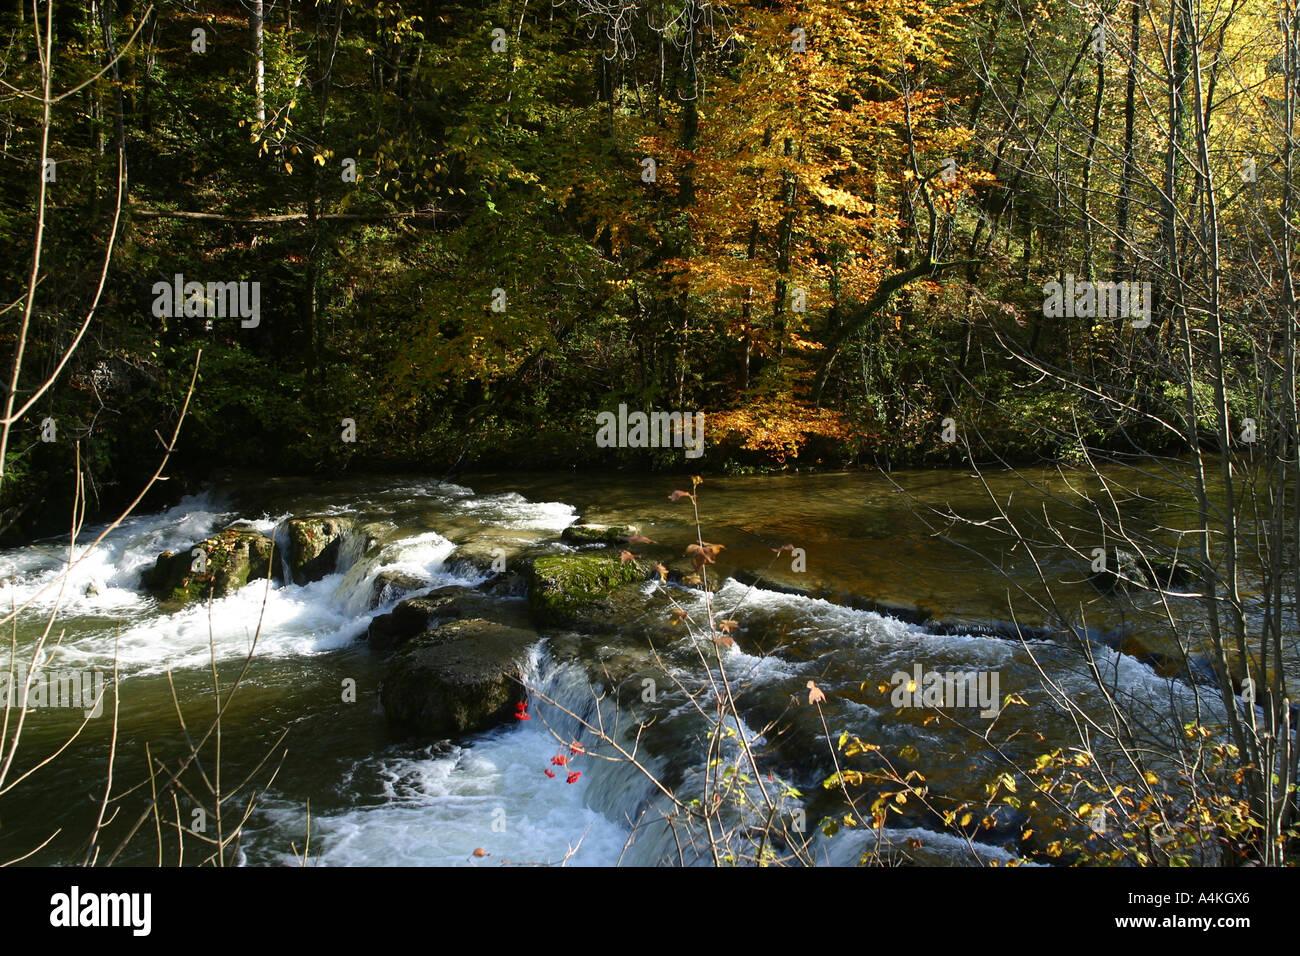 France, Jura, stream - Stock Image